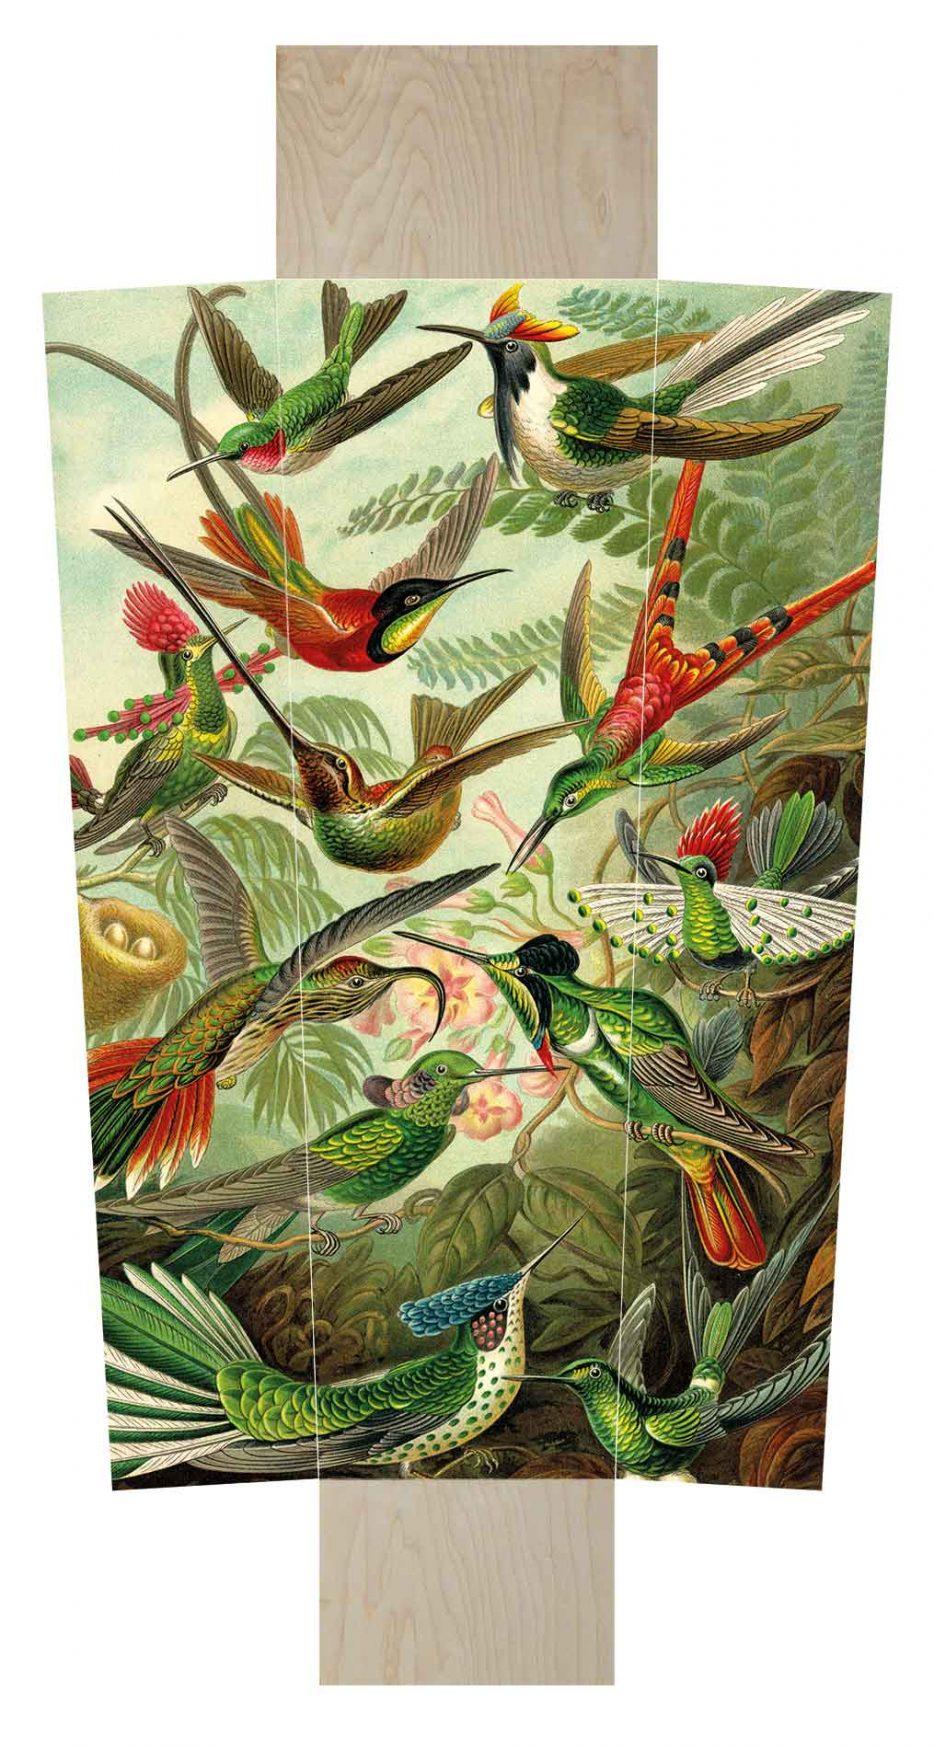 Uitvaartkist Doodskist Beerenberg vogels Heackel layout